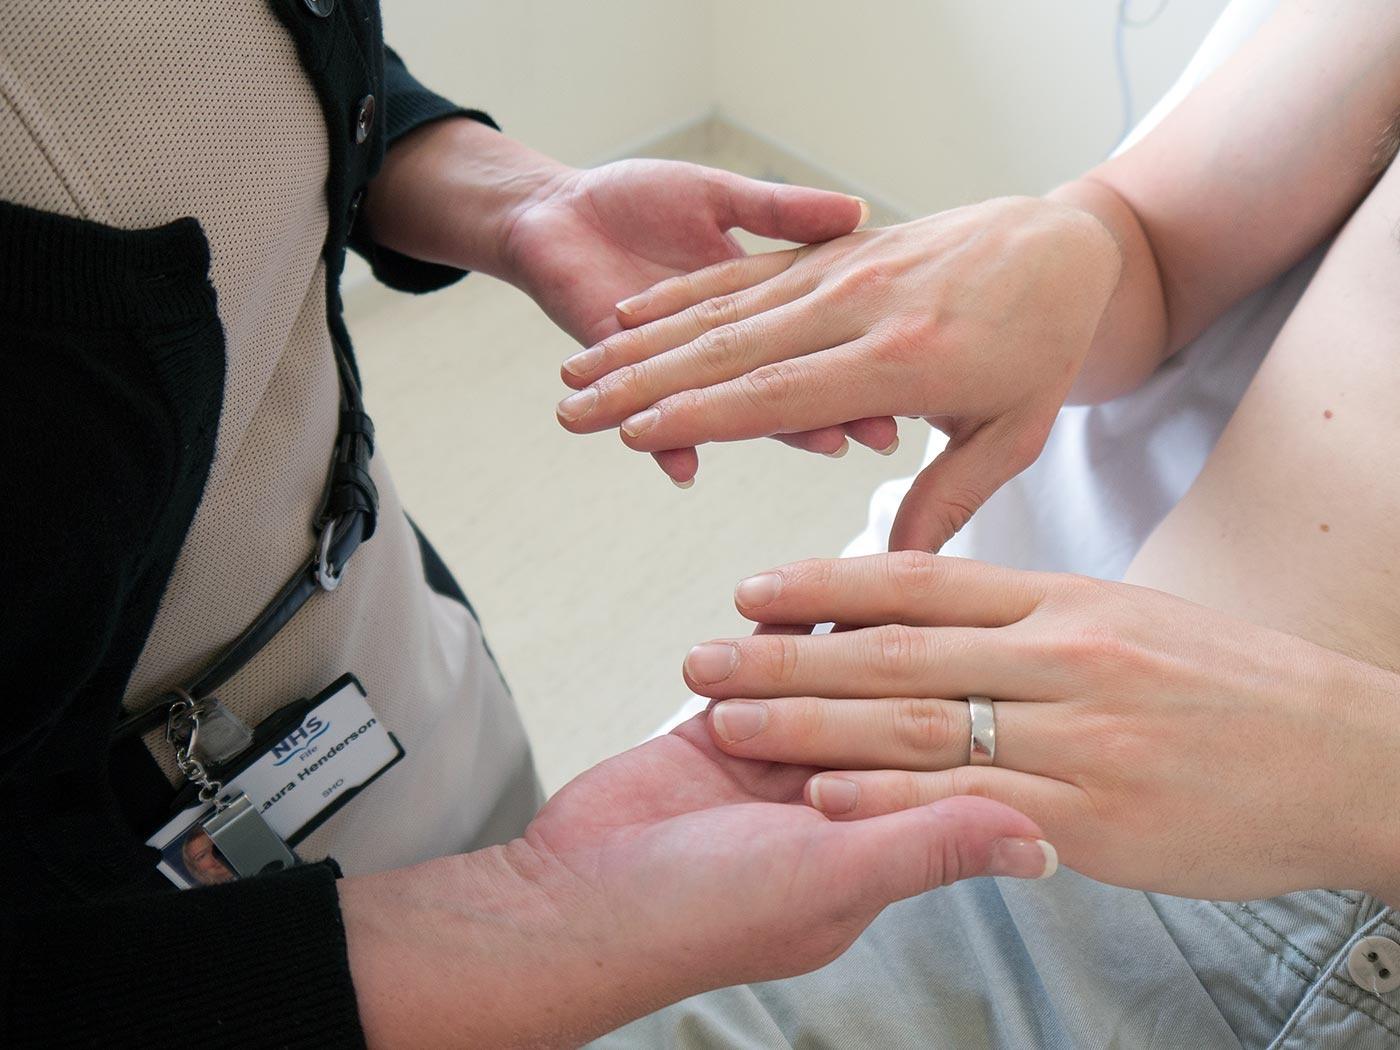 Inspect the patient's hands